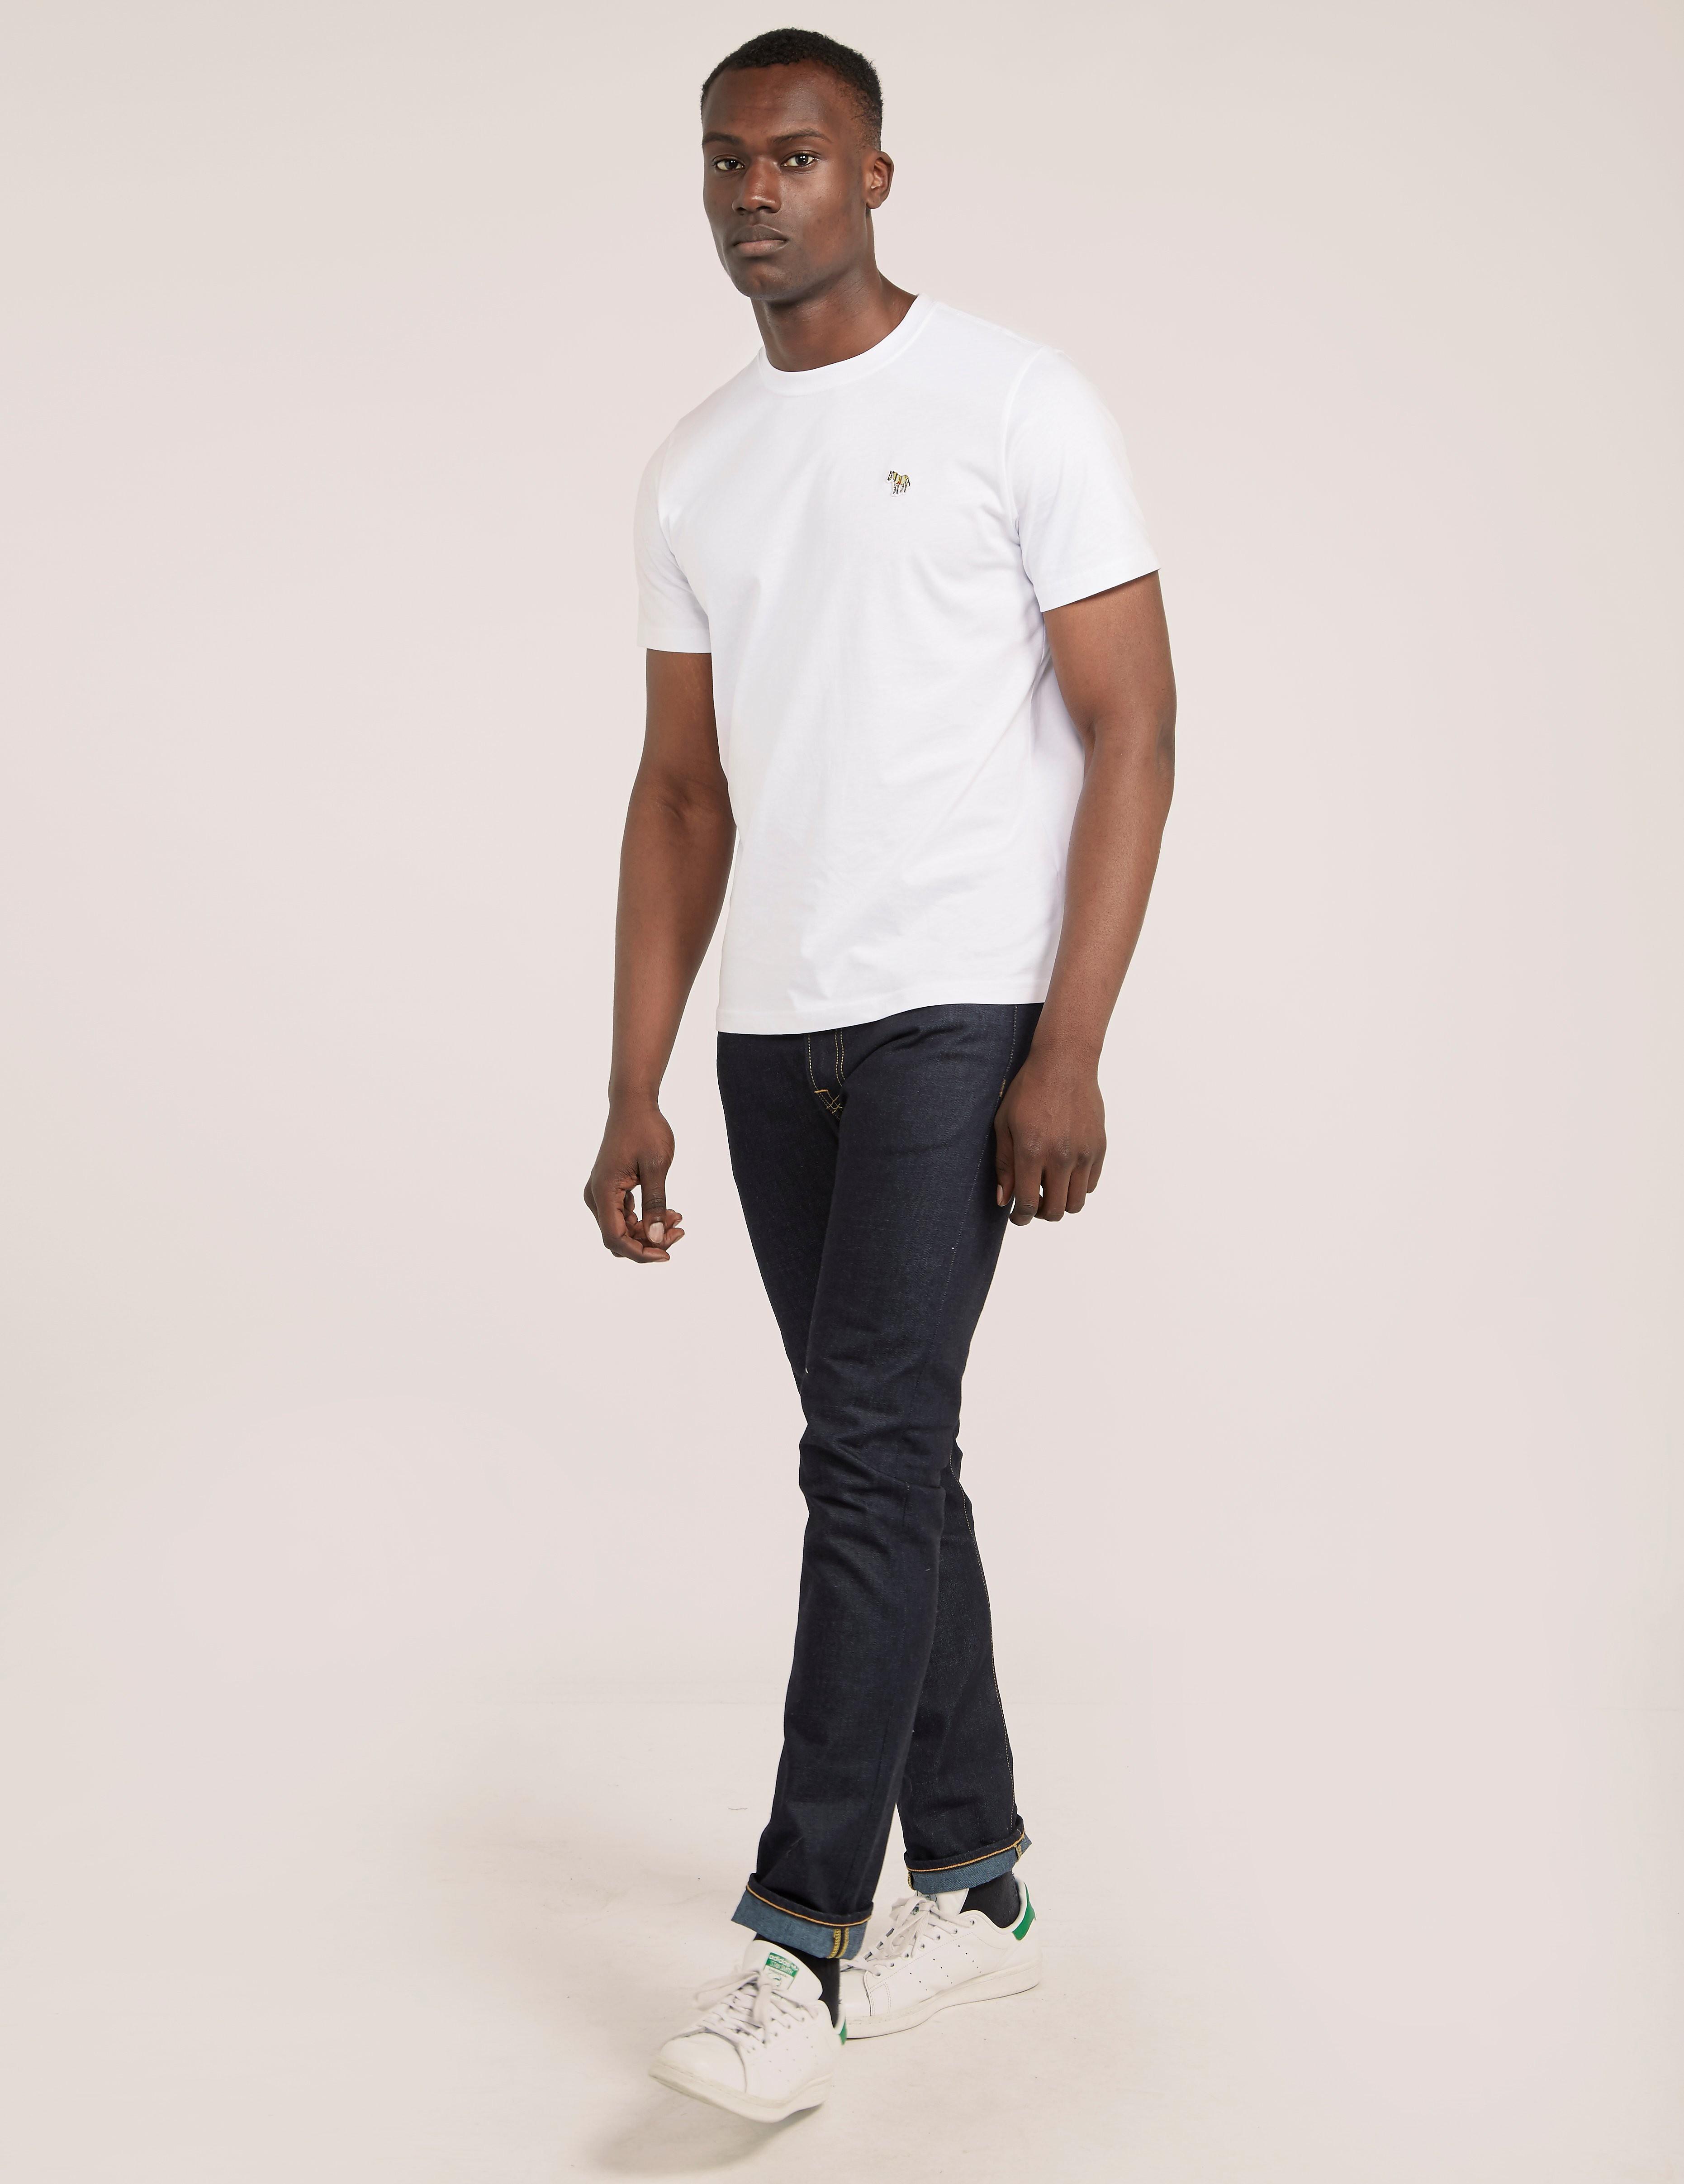 Paul Smith Zebra Logo Short Sleeve T-Shirt